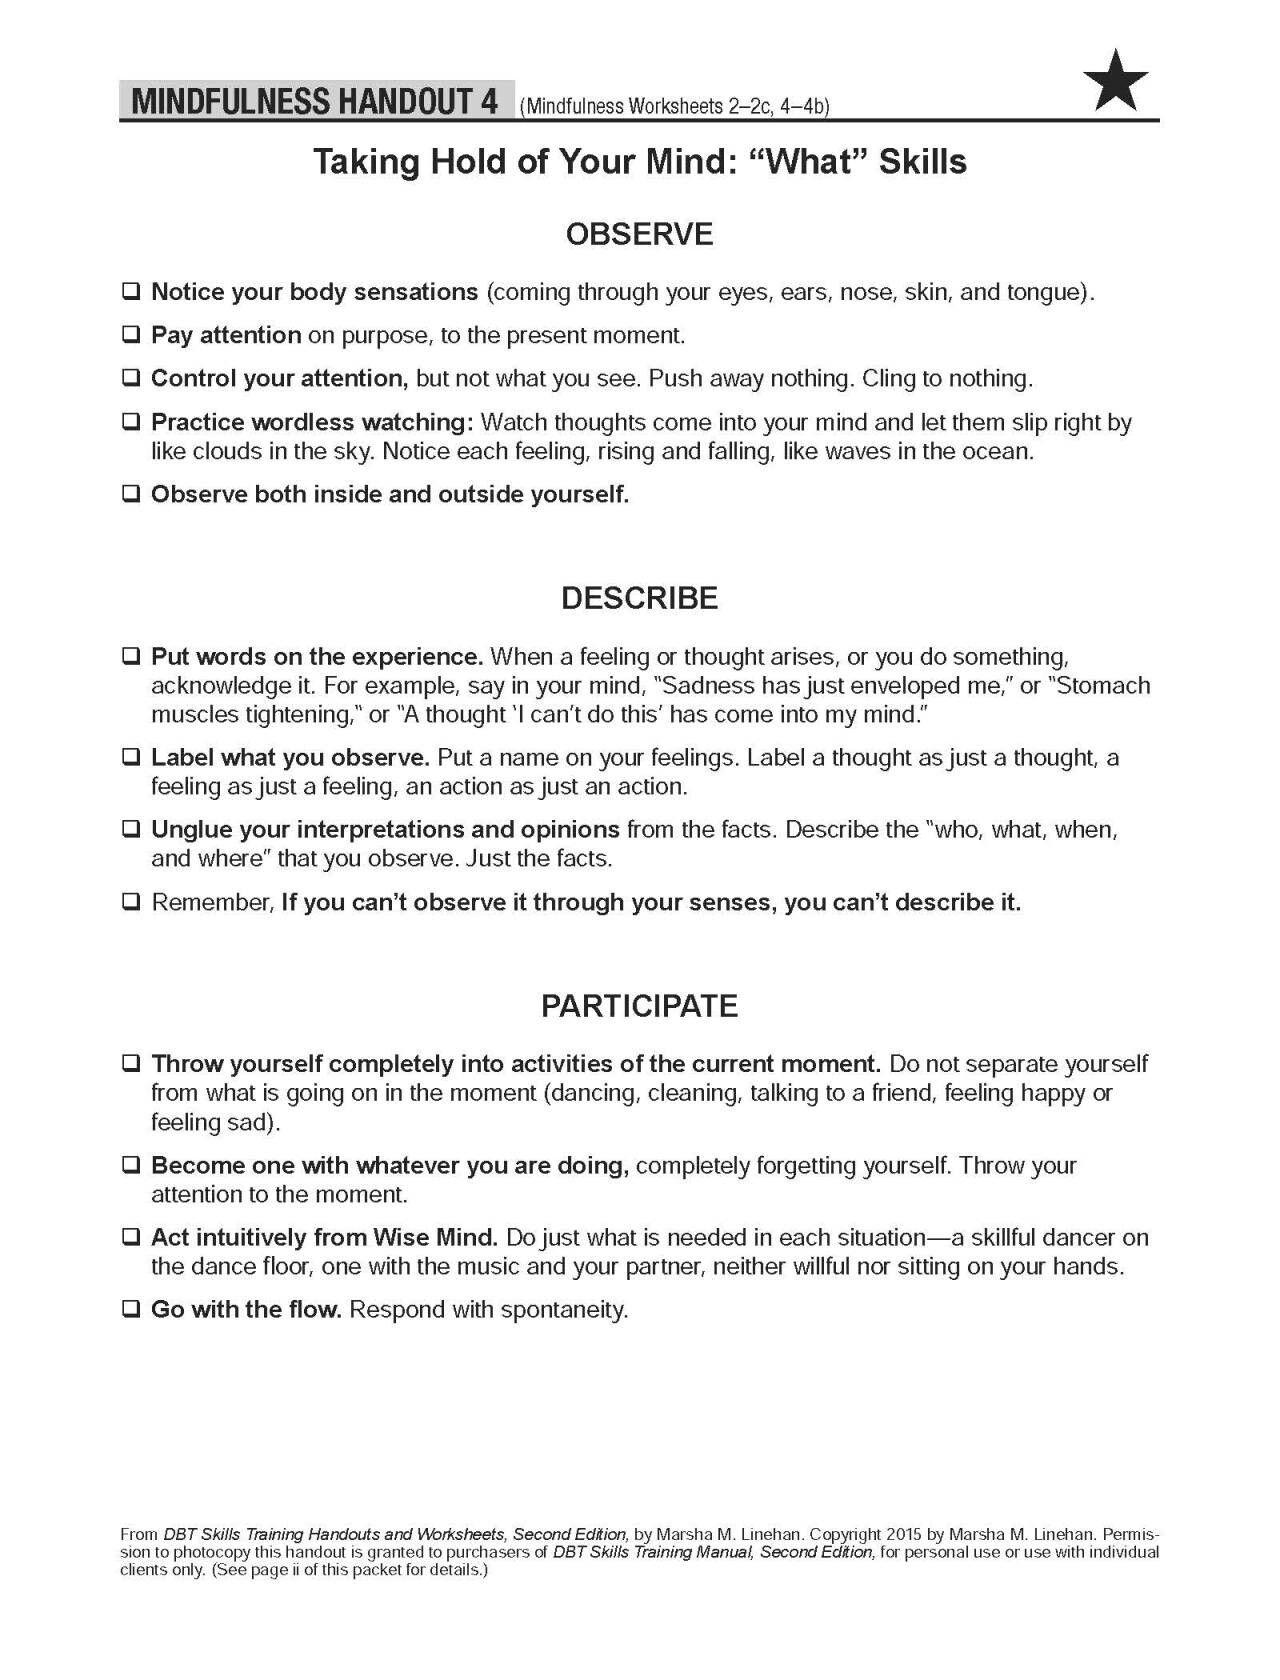 Mindfulness Handout 4